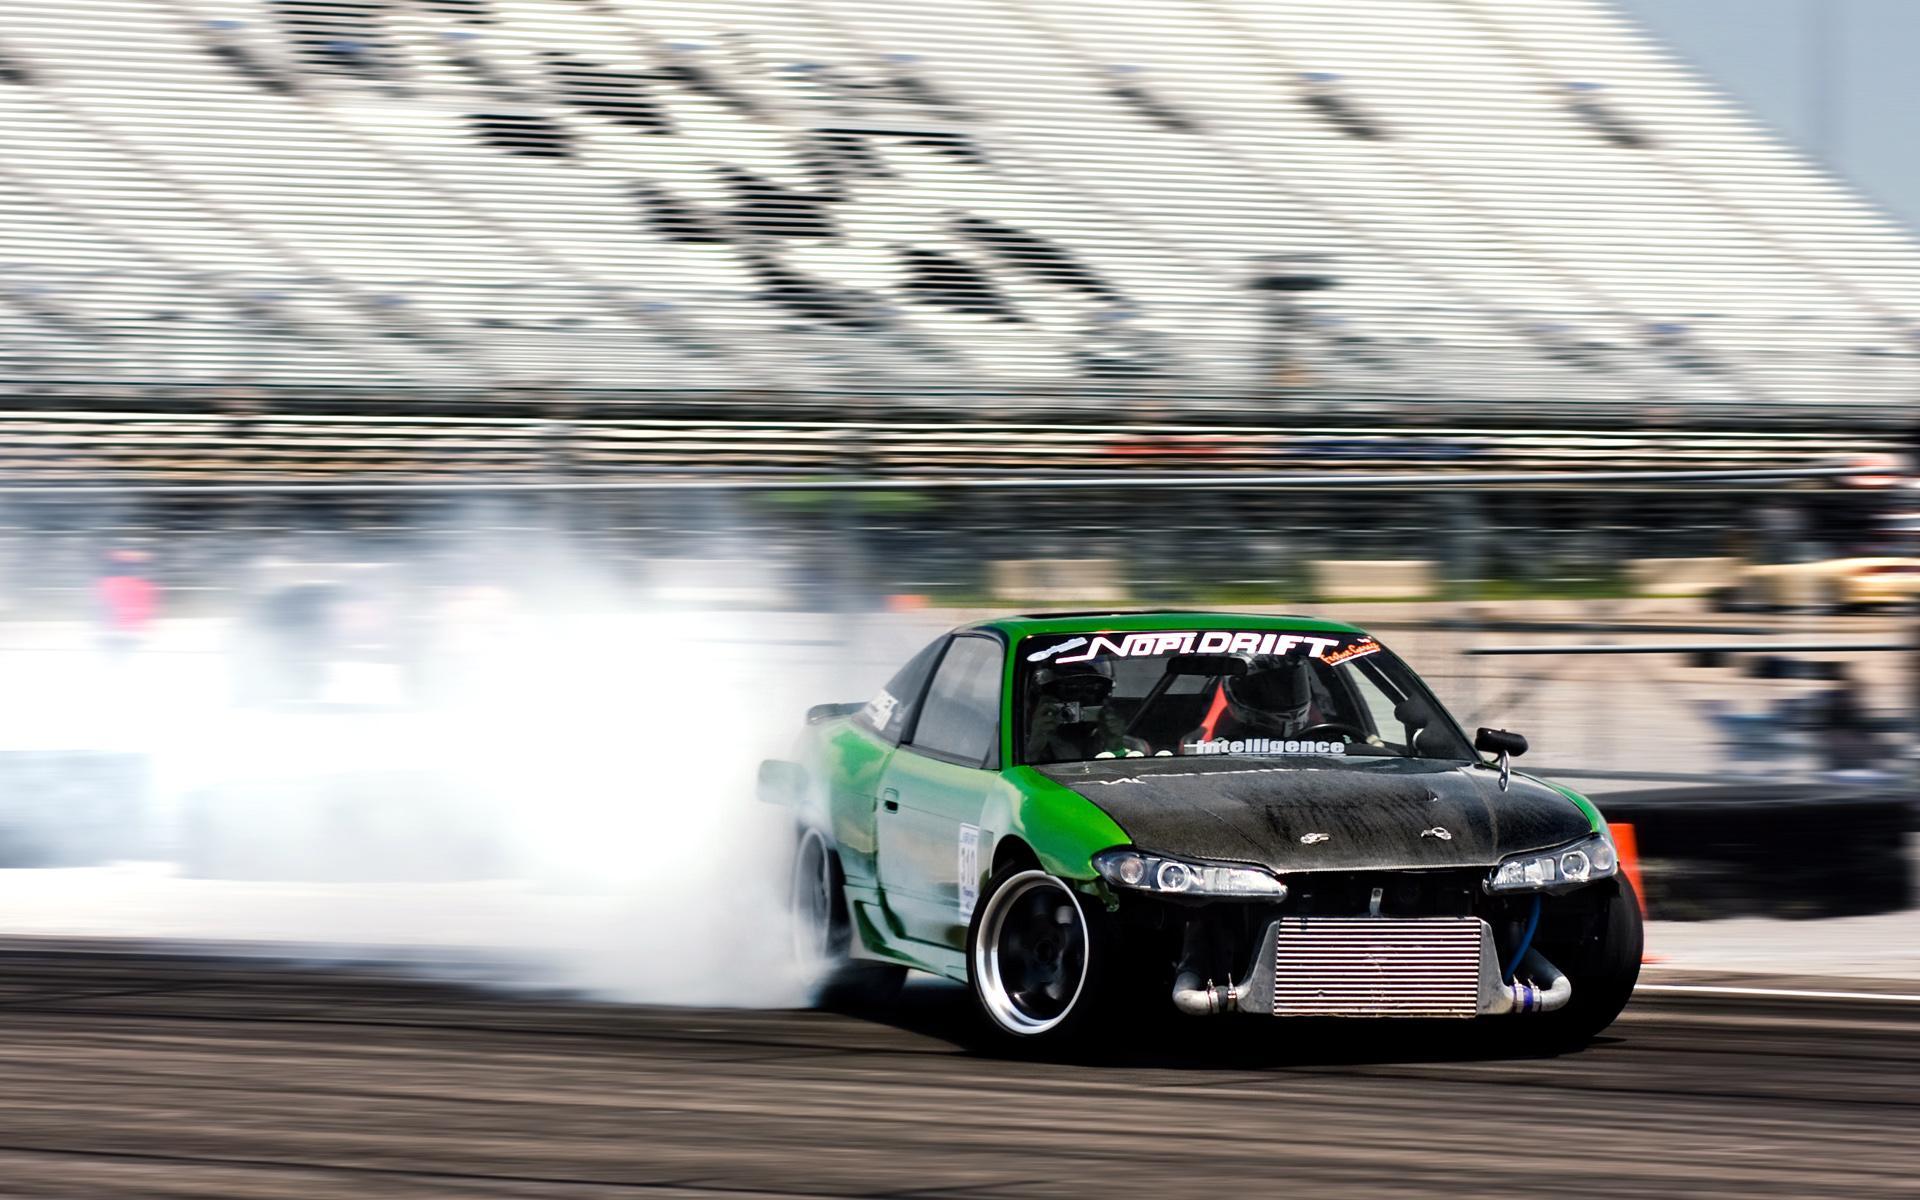 videos de carros fazendo drift para